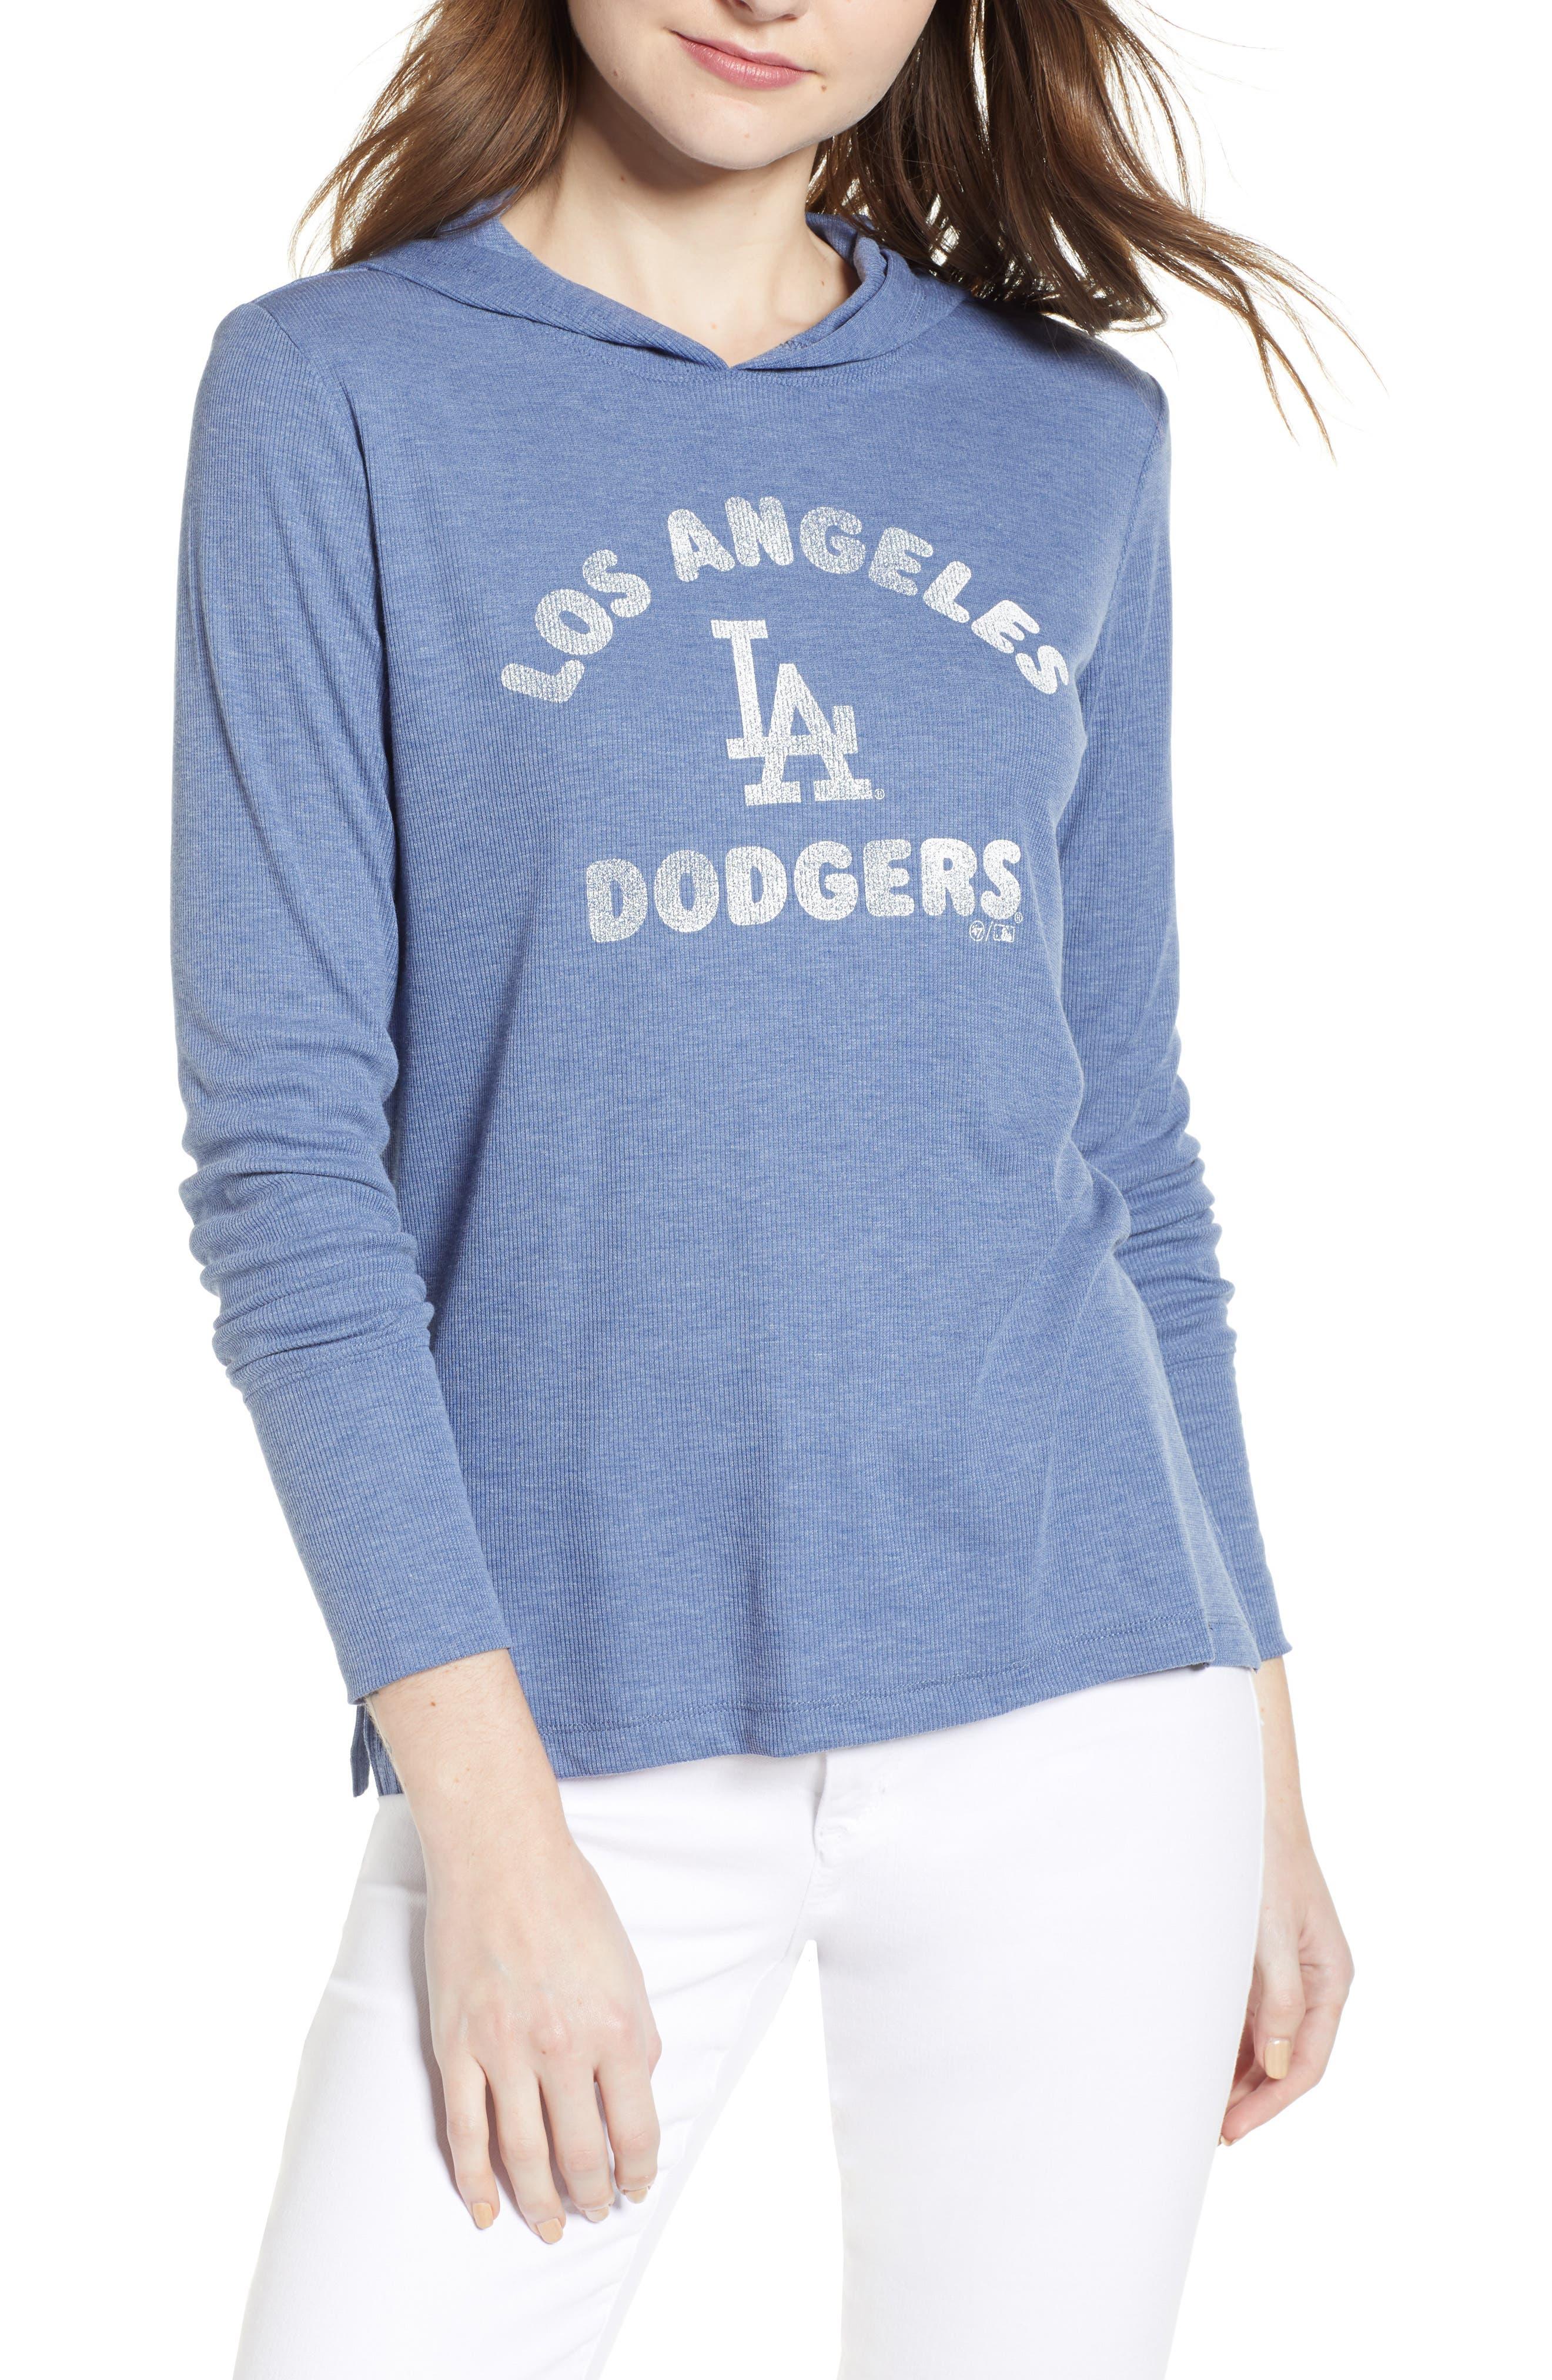 Campbell Los Angeles Dodgers Rib Knit Hooded Top,                             Main thumbnail 1, color,                             400